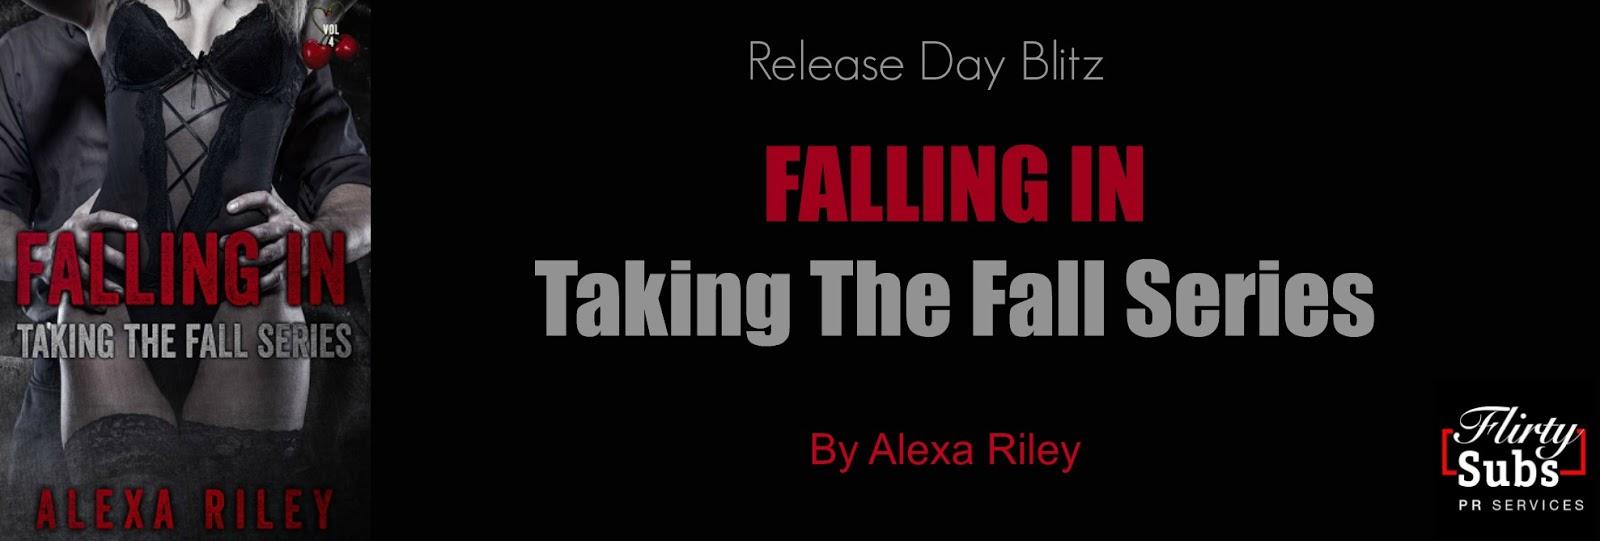 Fallinginrelease.jpg